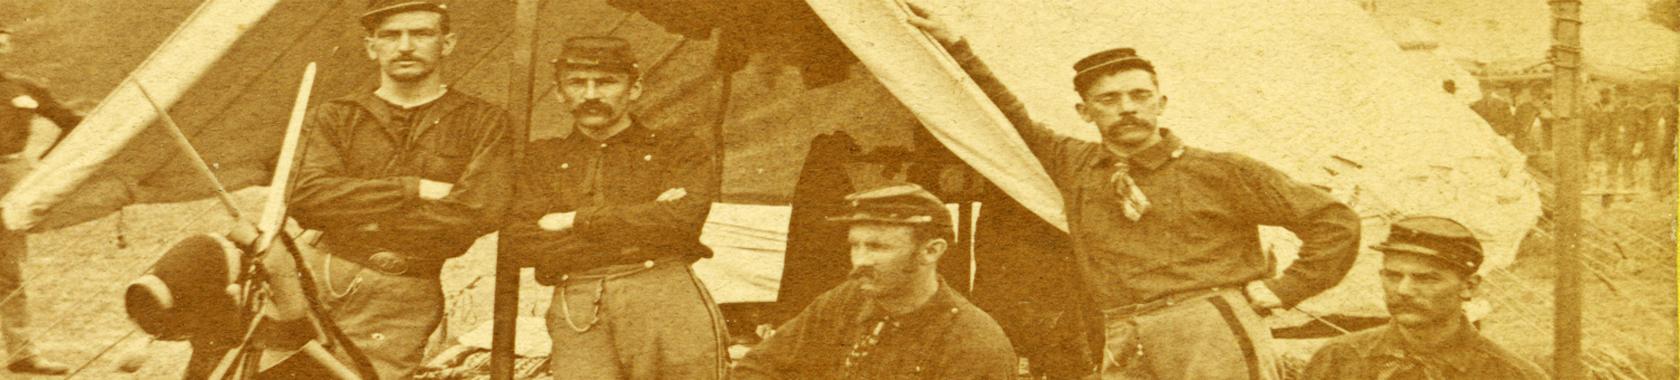 Teas at Two: Michigan Notables: Civil War